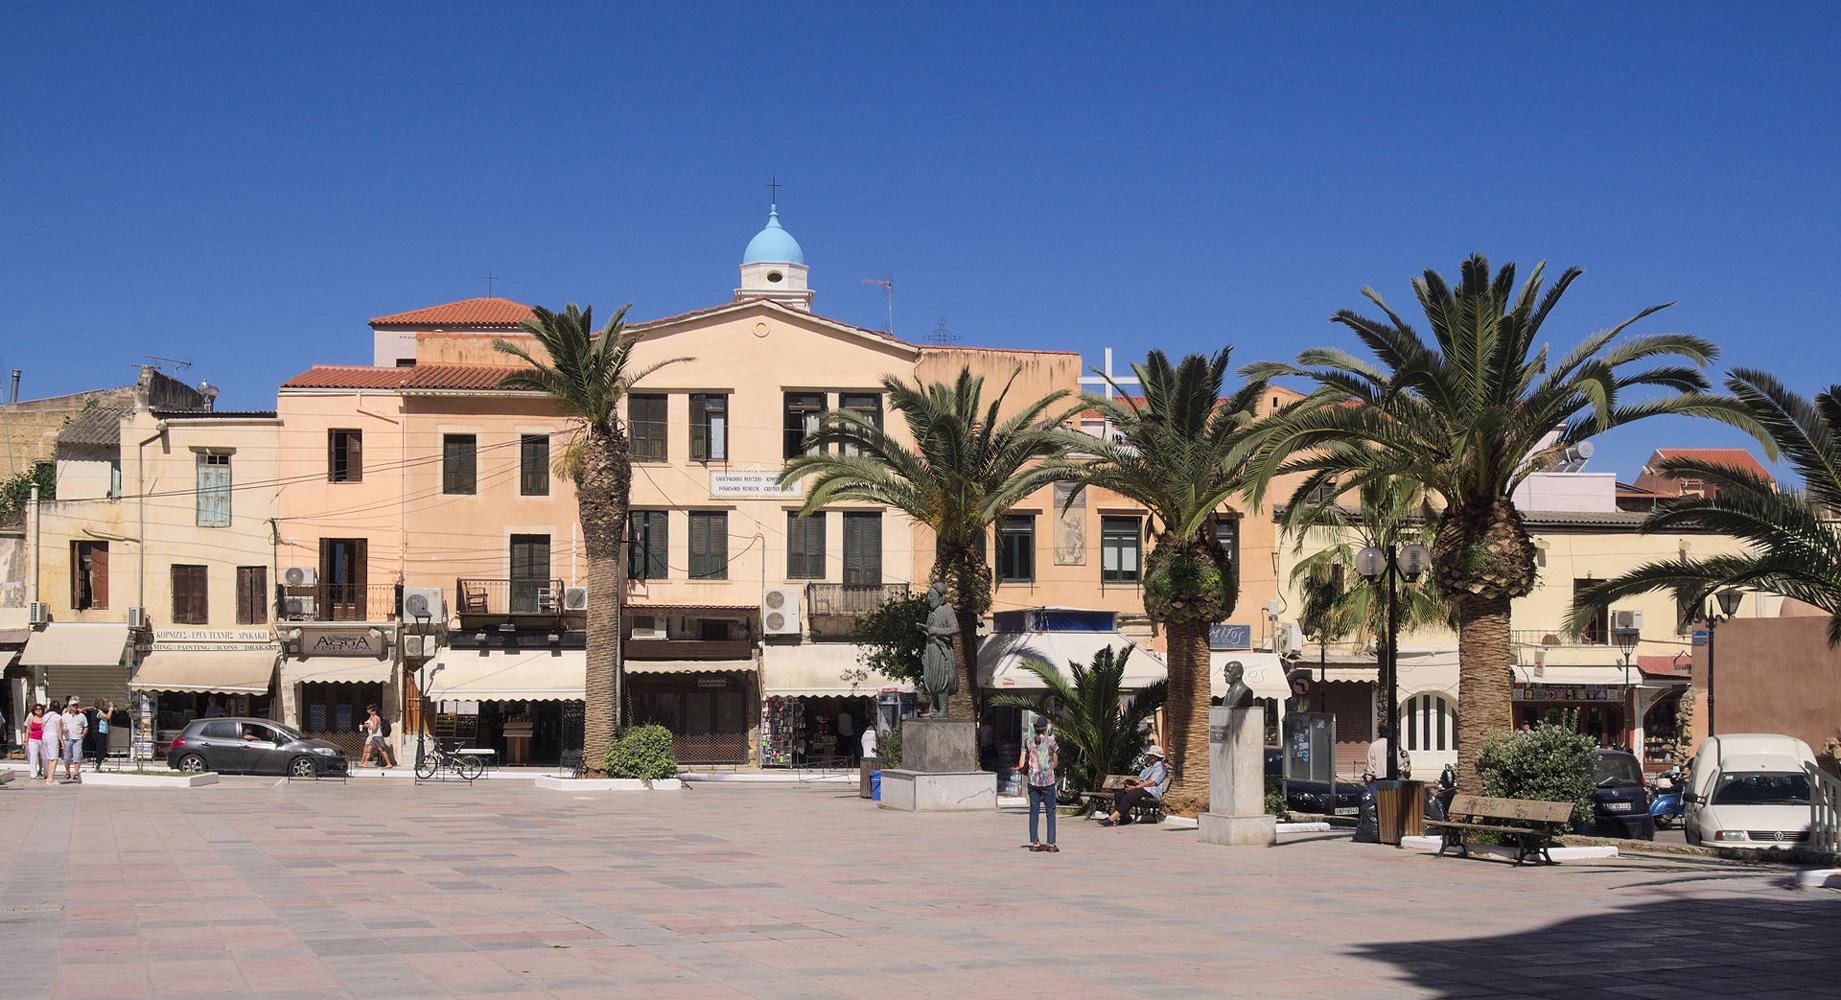 view from the Mitropoli Square